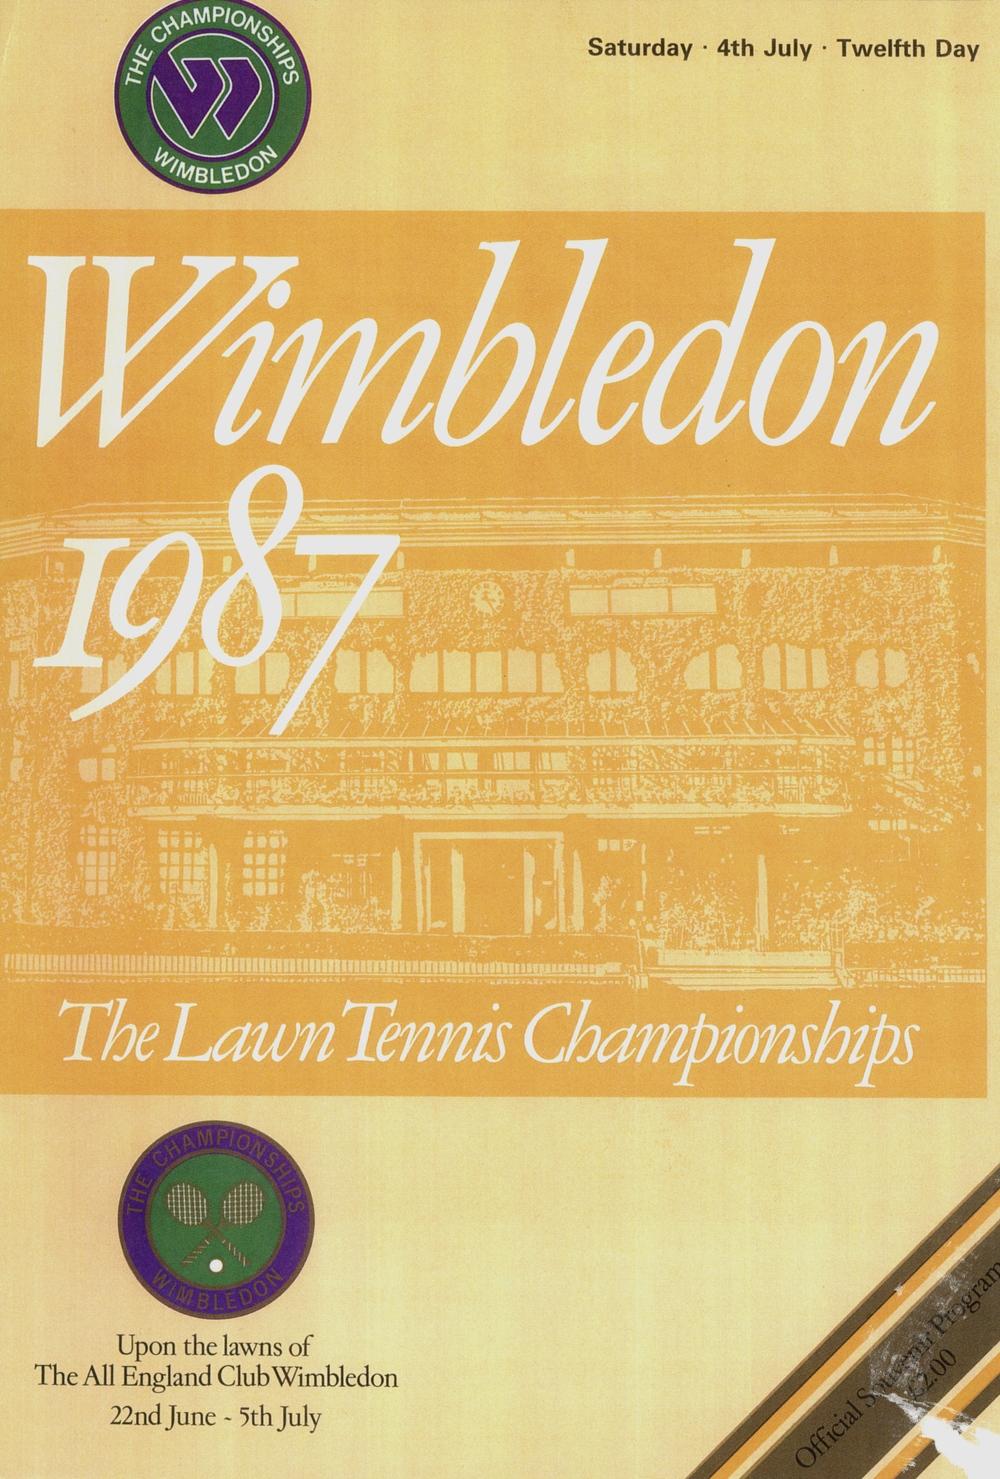 Wimbledon002-1 (dragged).jpg